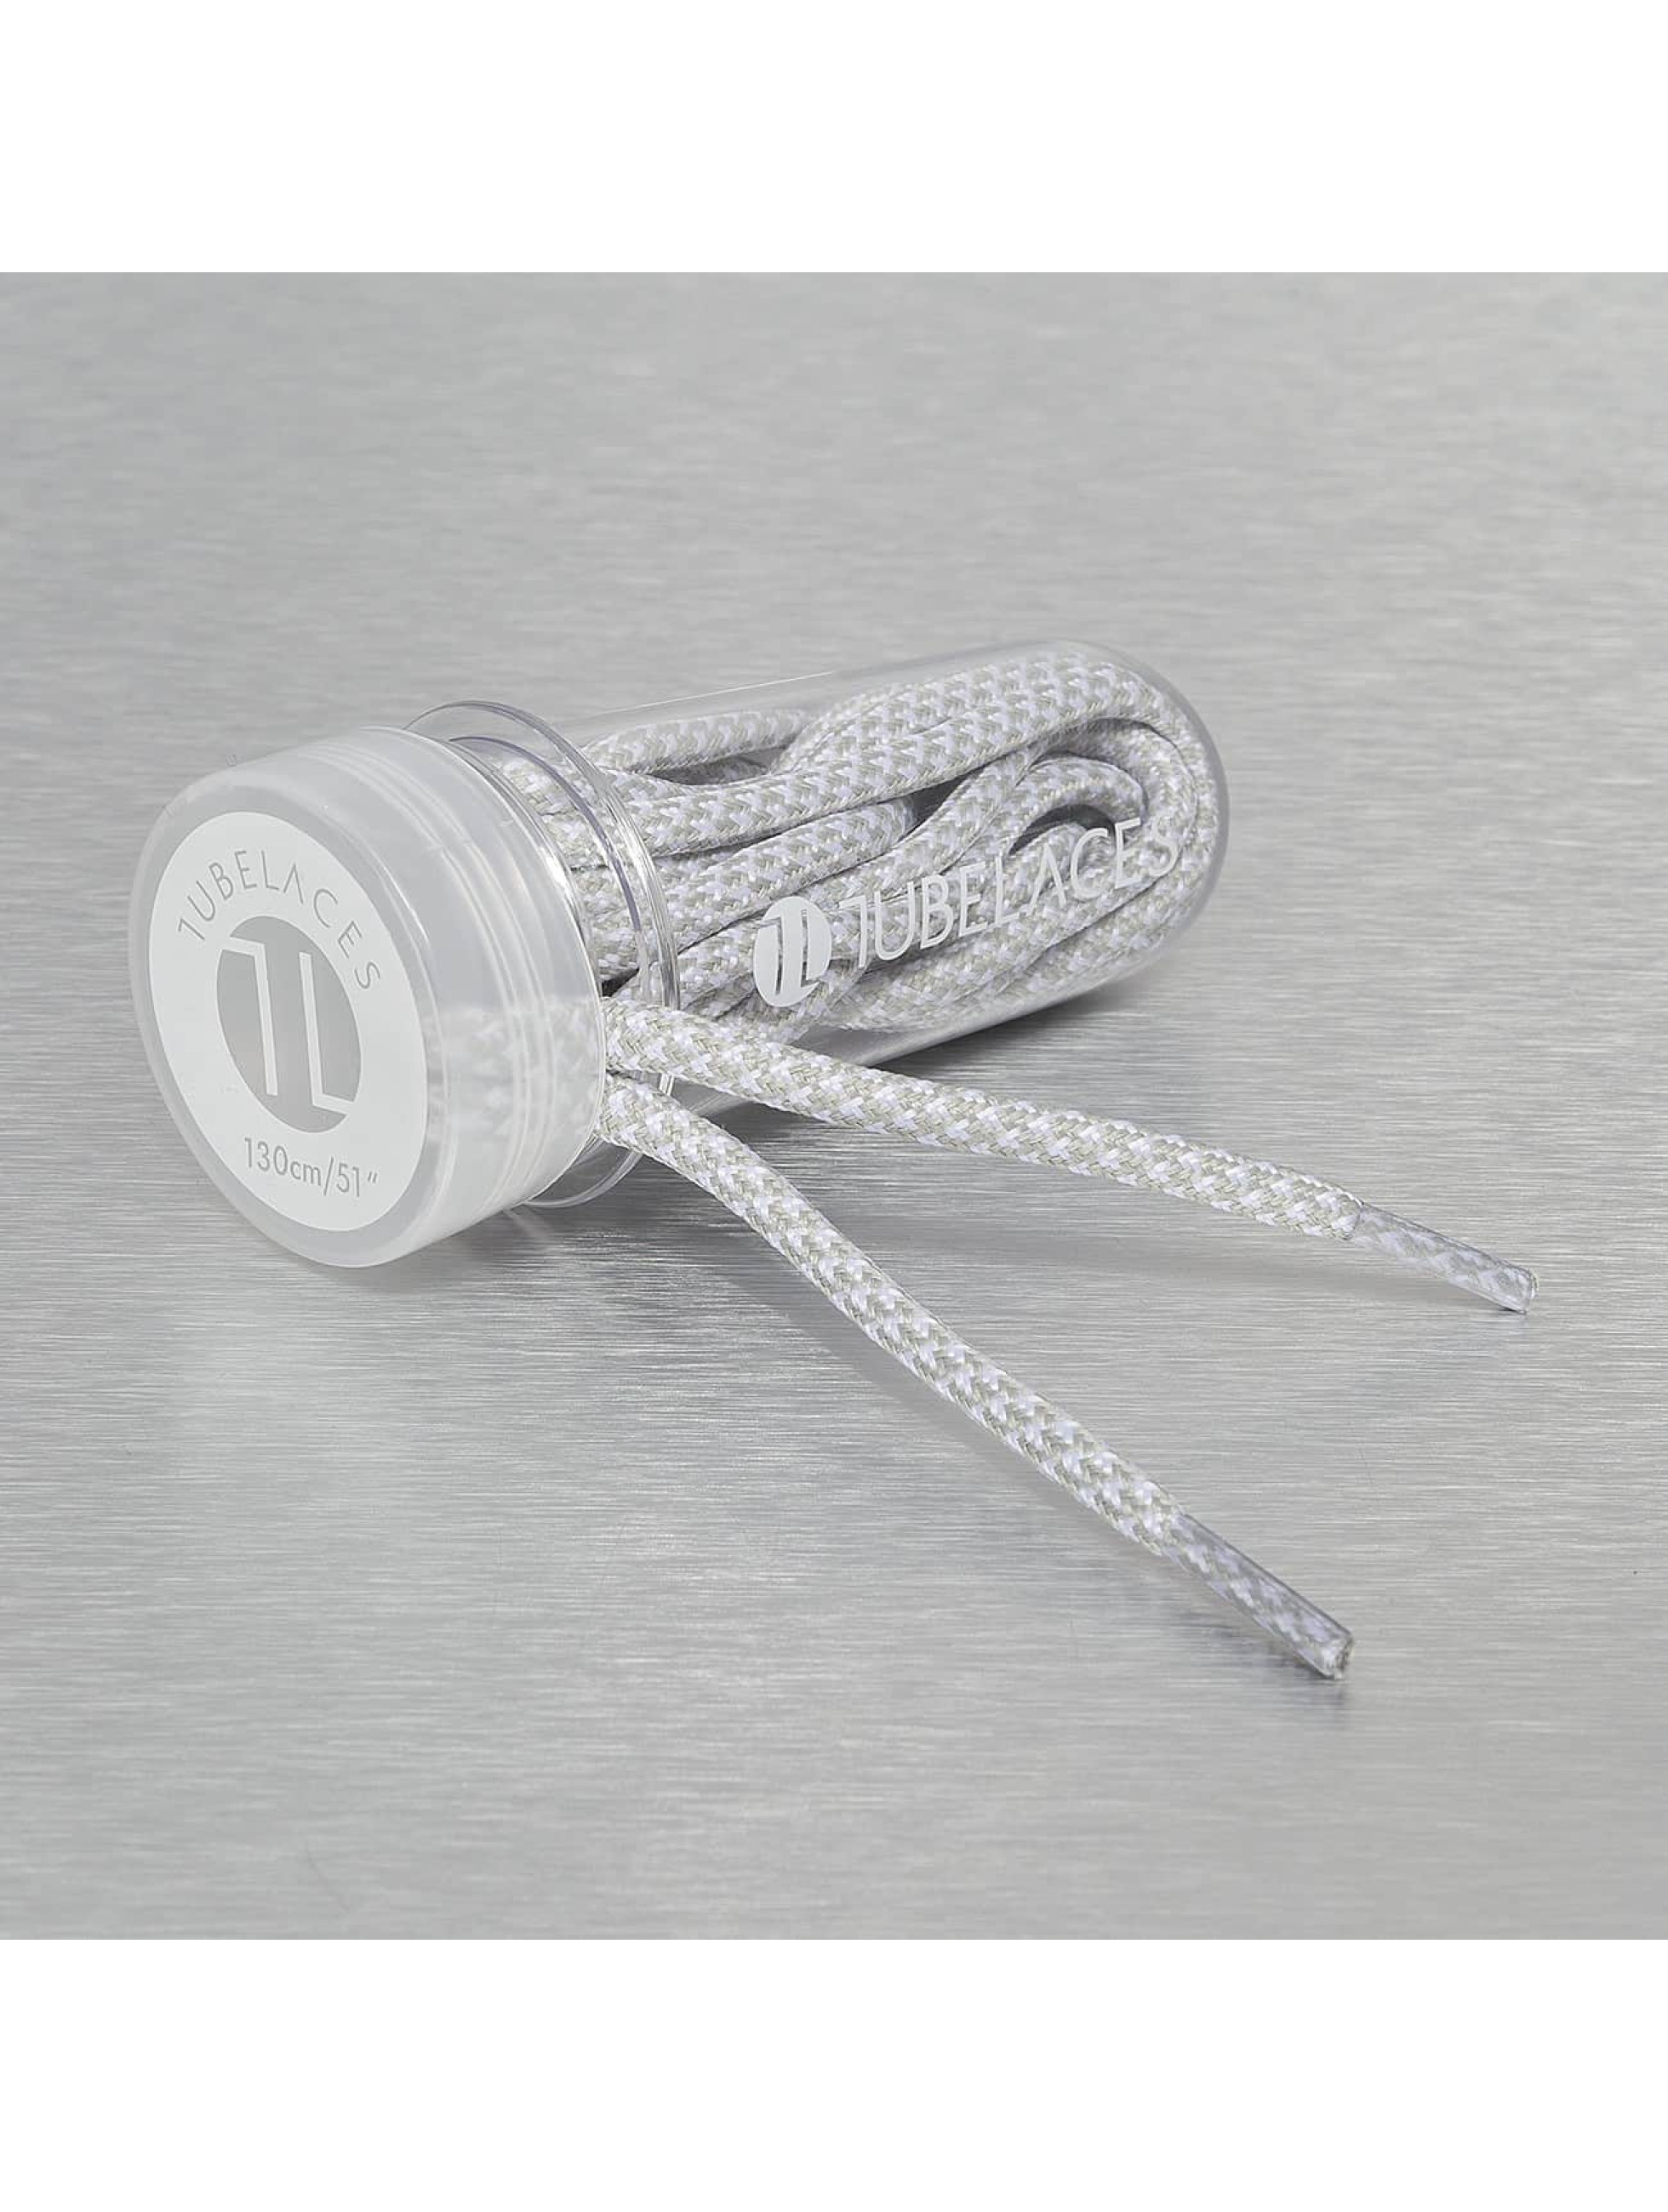 Tubelaces Veter Rope Multi wit